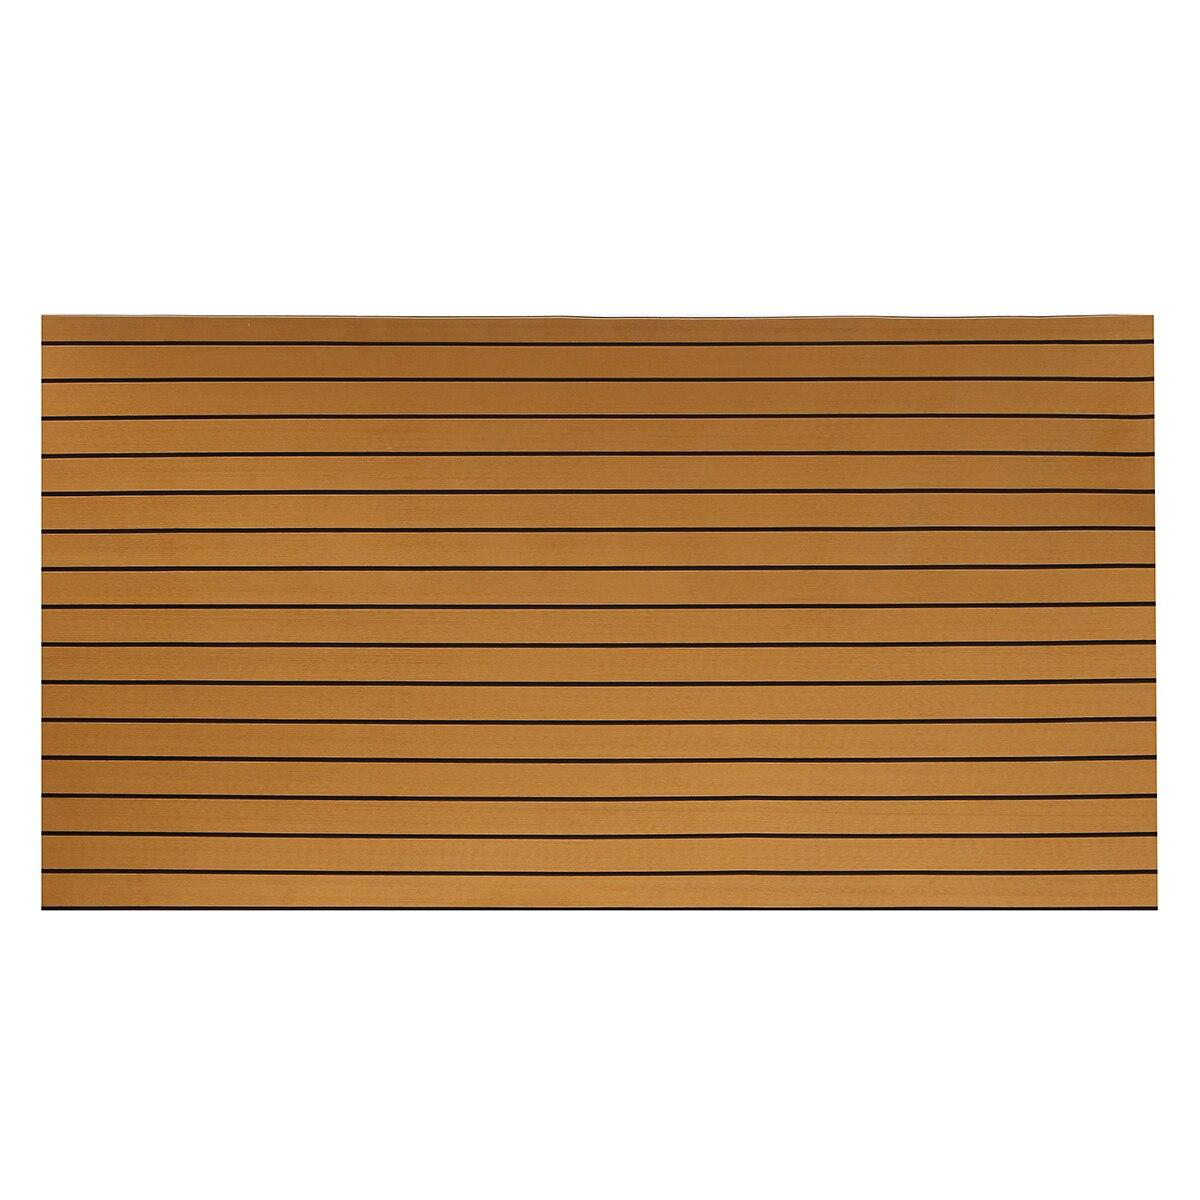 240cmx90cmx5mm Self-Adhesive Gold With Black Lines Marine Flooring Faux Teak EVA Foam Boat Decking Sheet